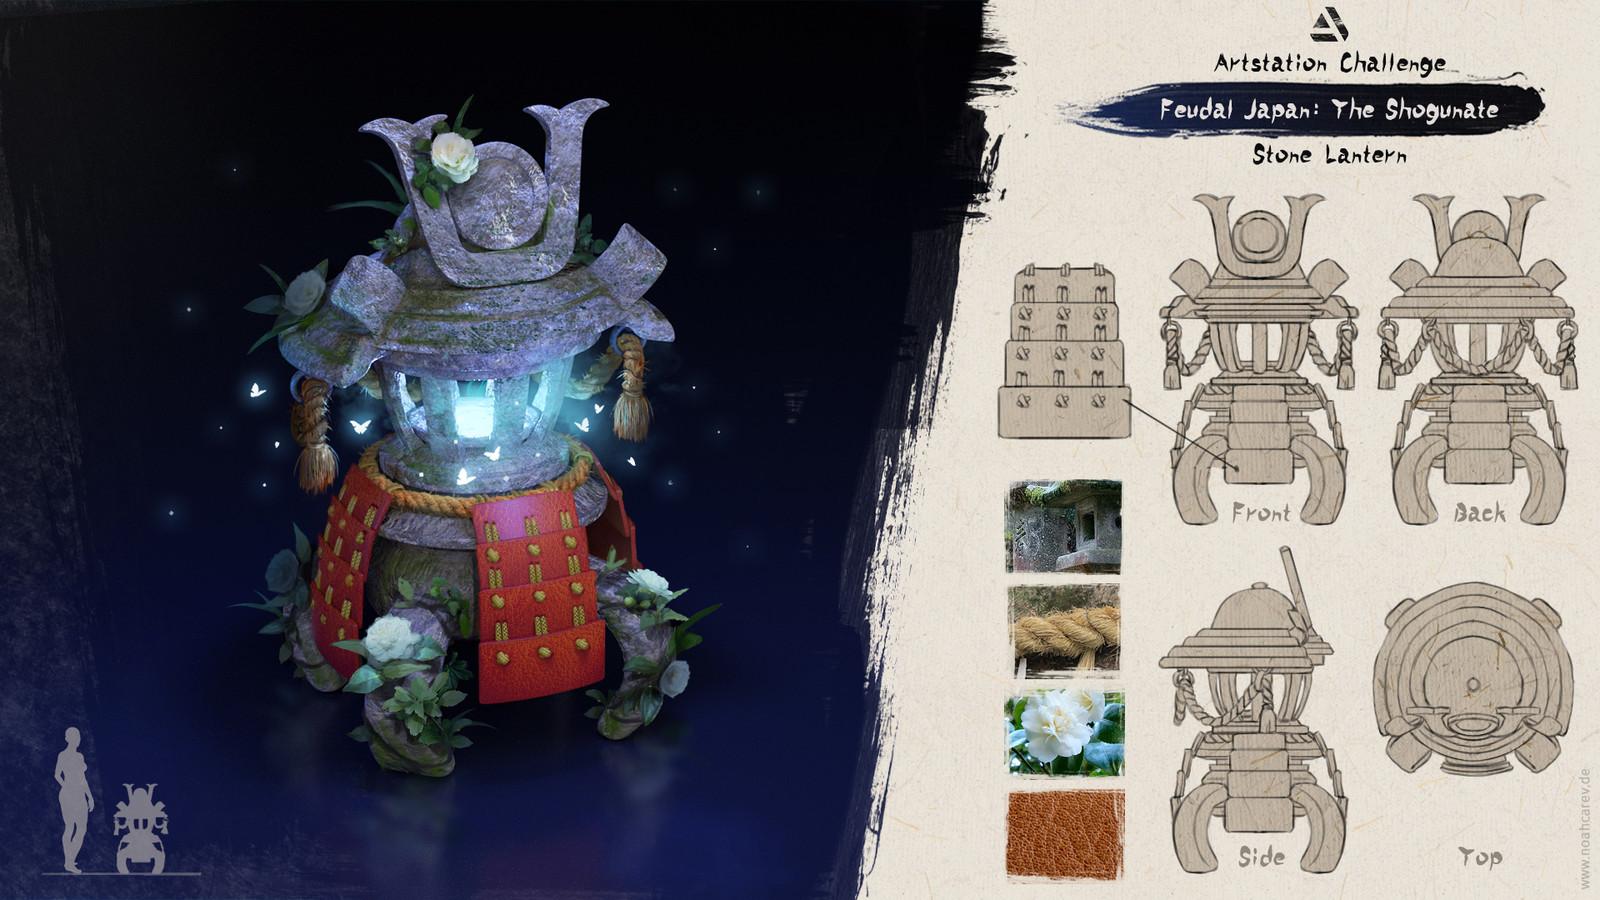 Breakdown Stone lantern